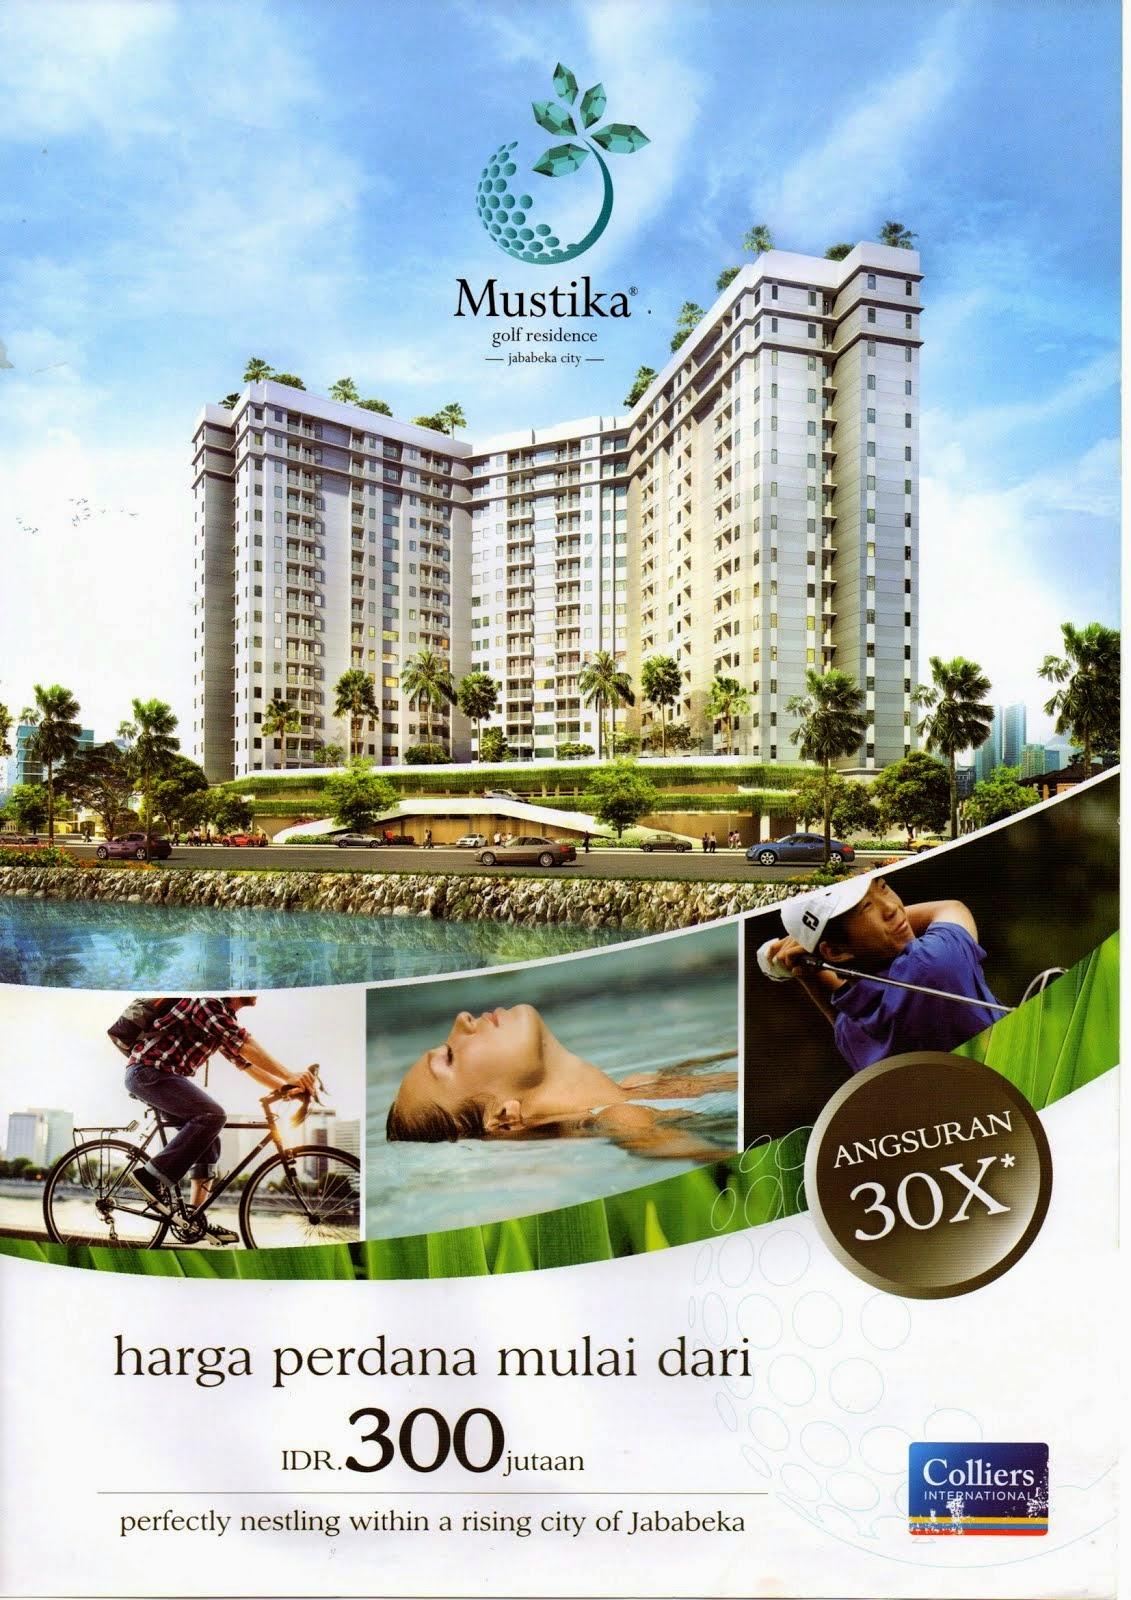 Mustika Golf Resisdence by Jababeka